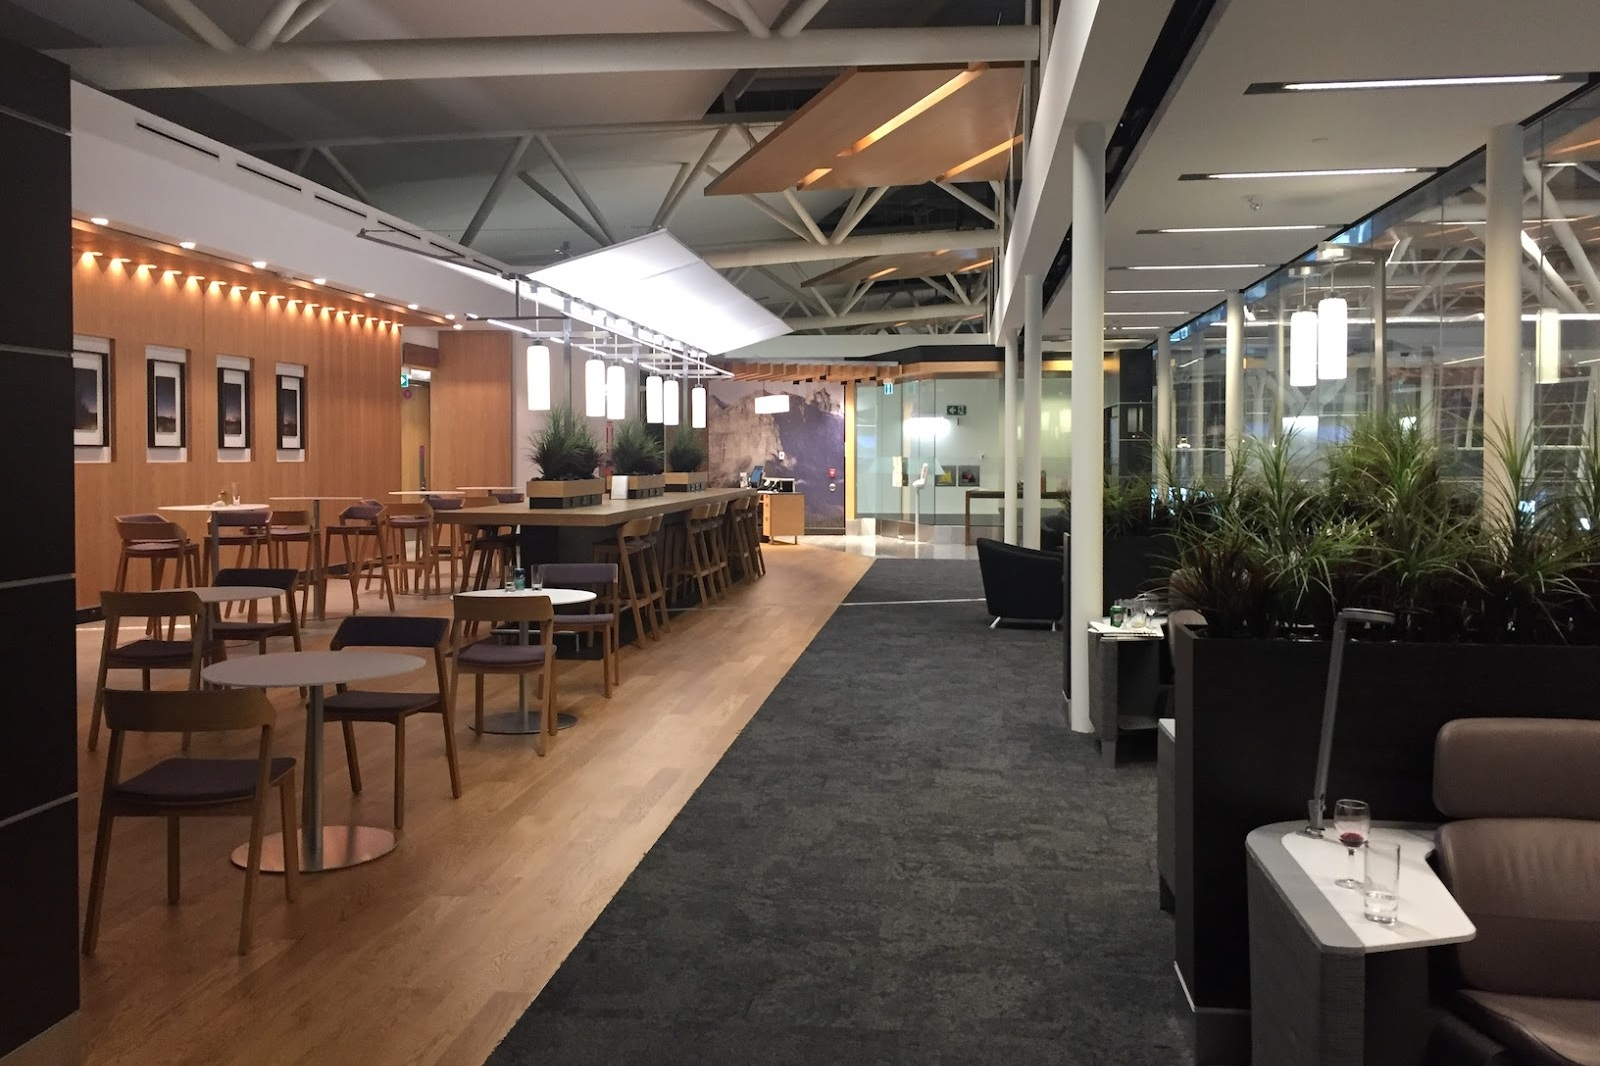 Aspire Lounge Calgary, by Swissport